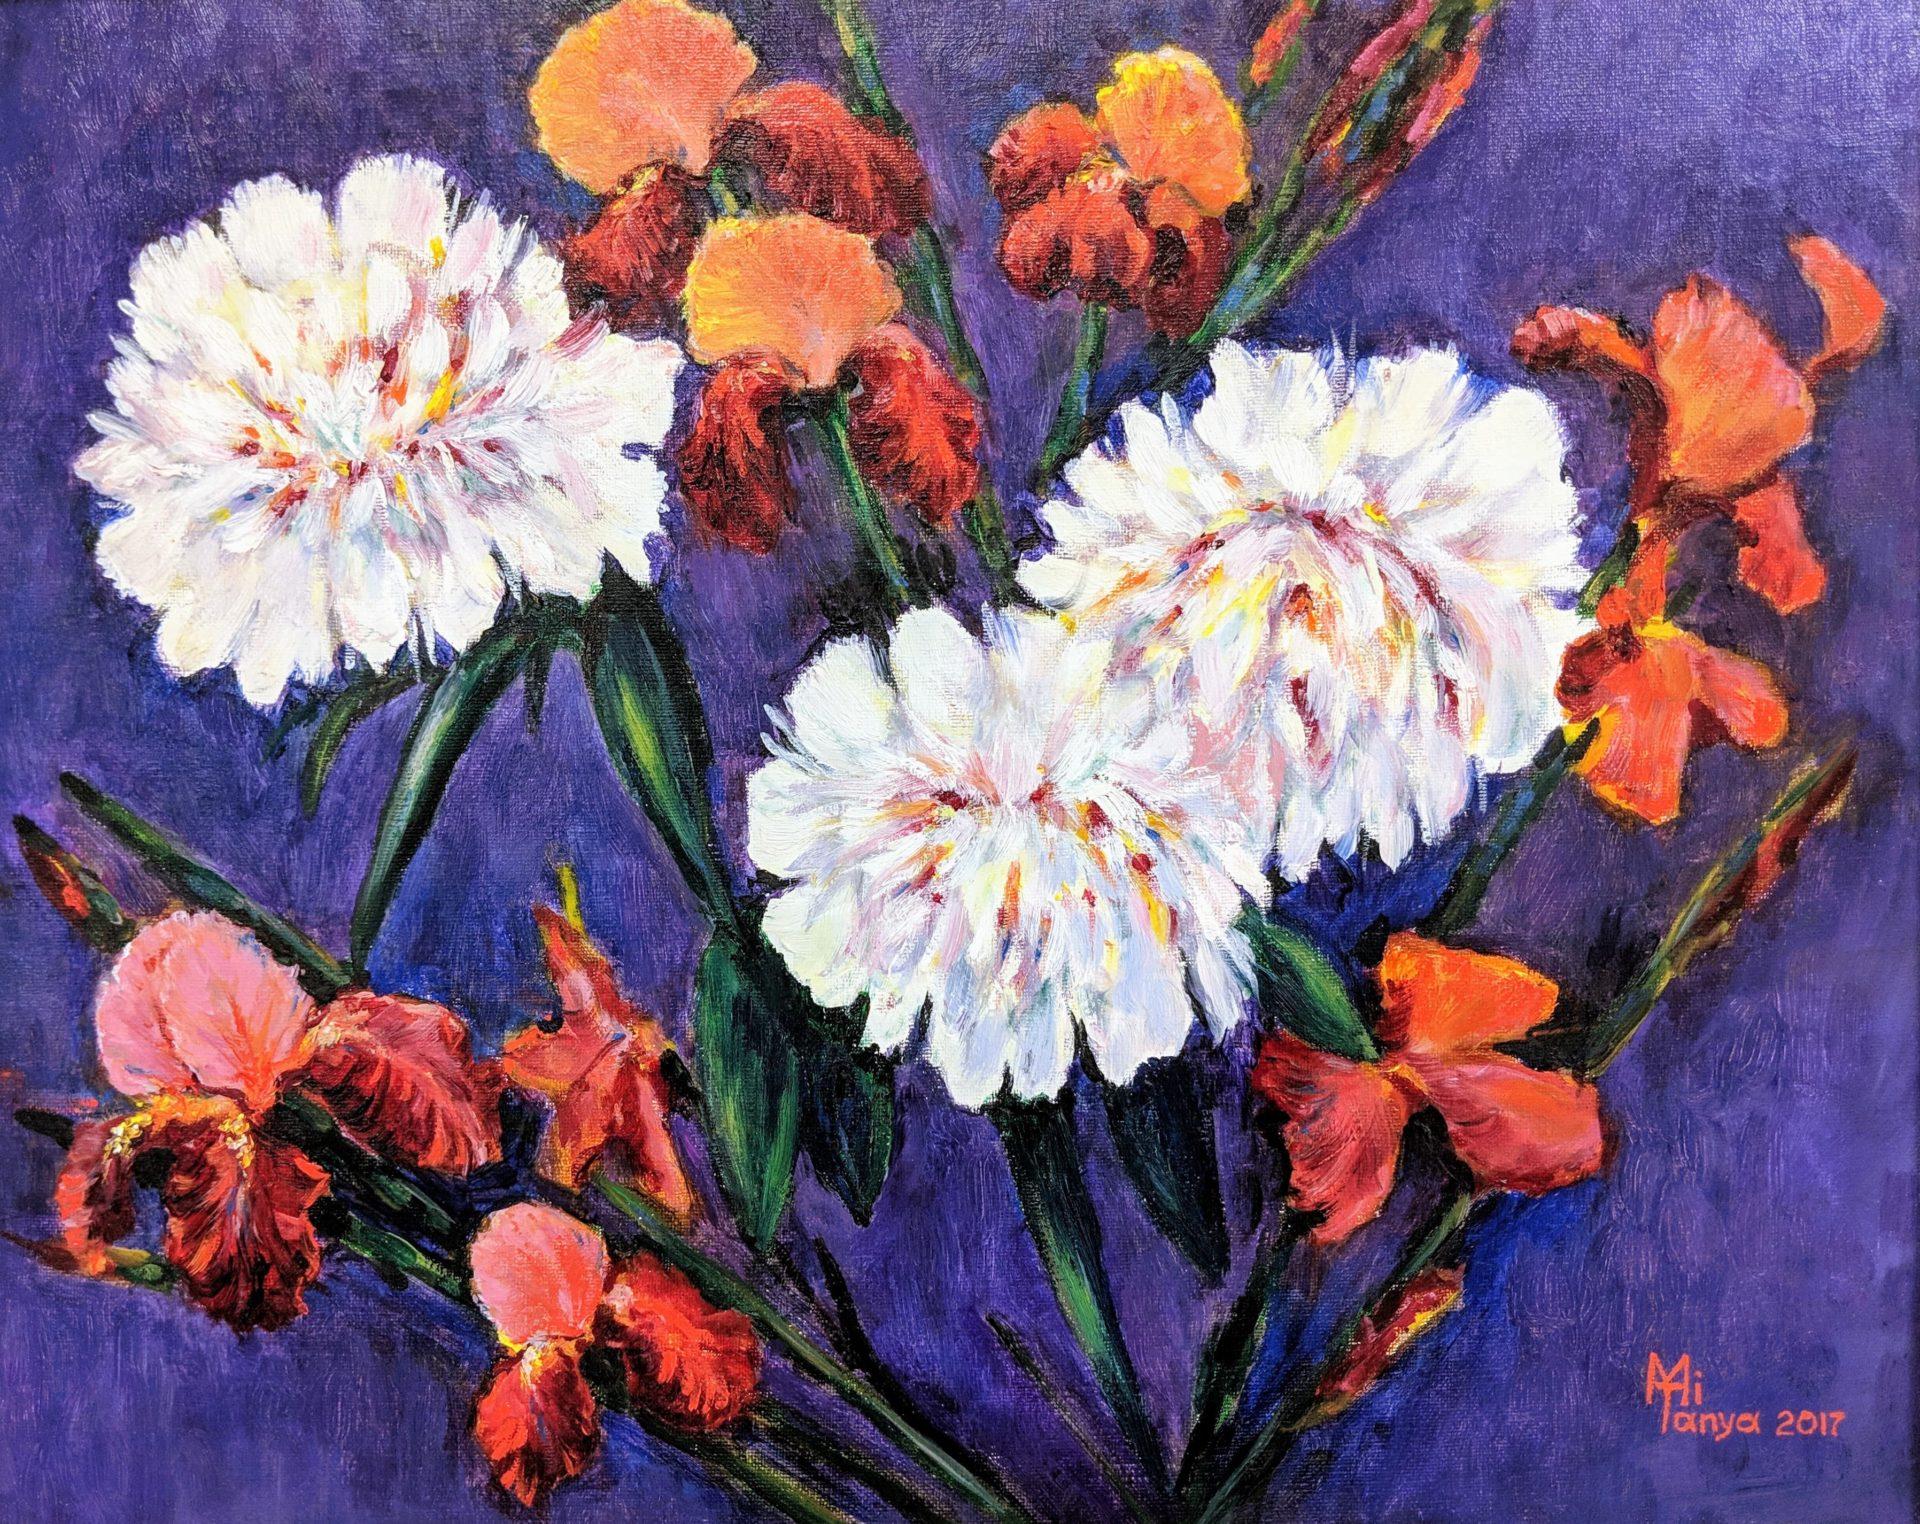 Flowers Salute